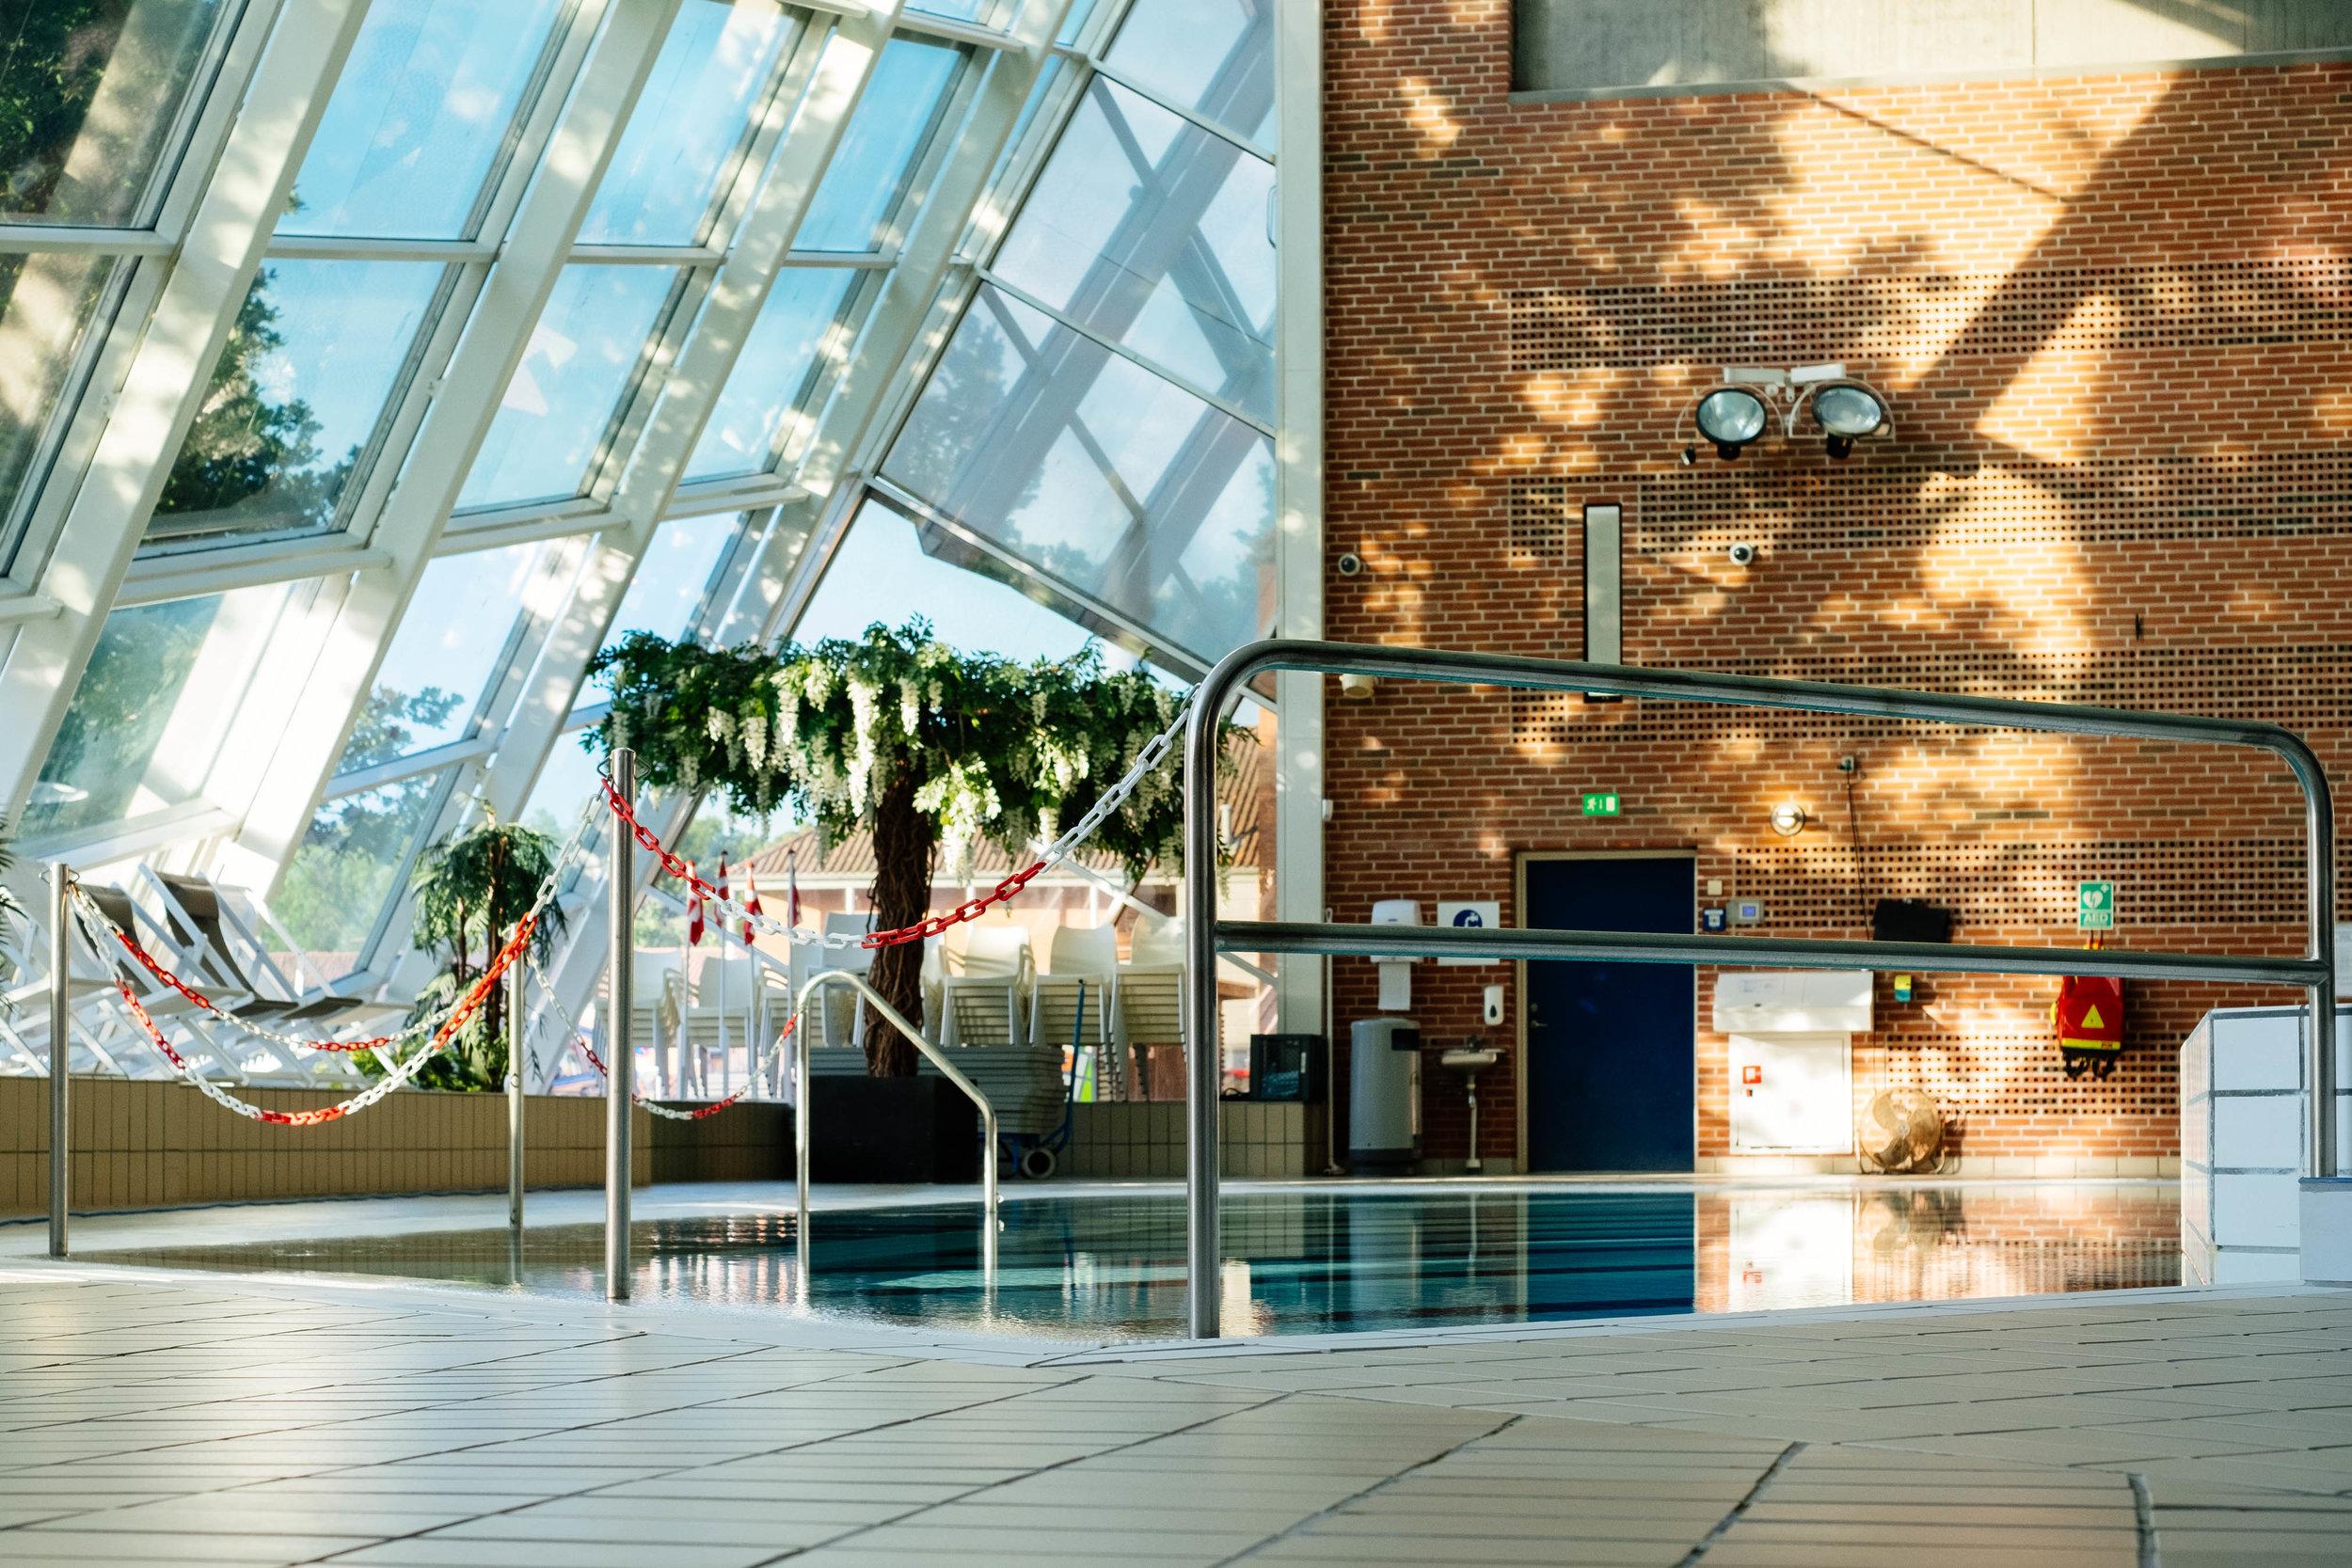 Photo: Claus Sall www.claussall.com